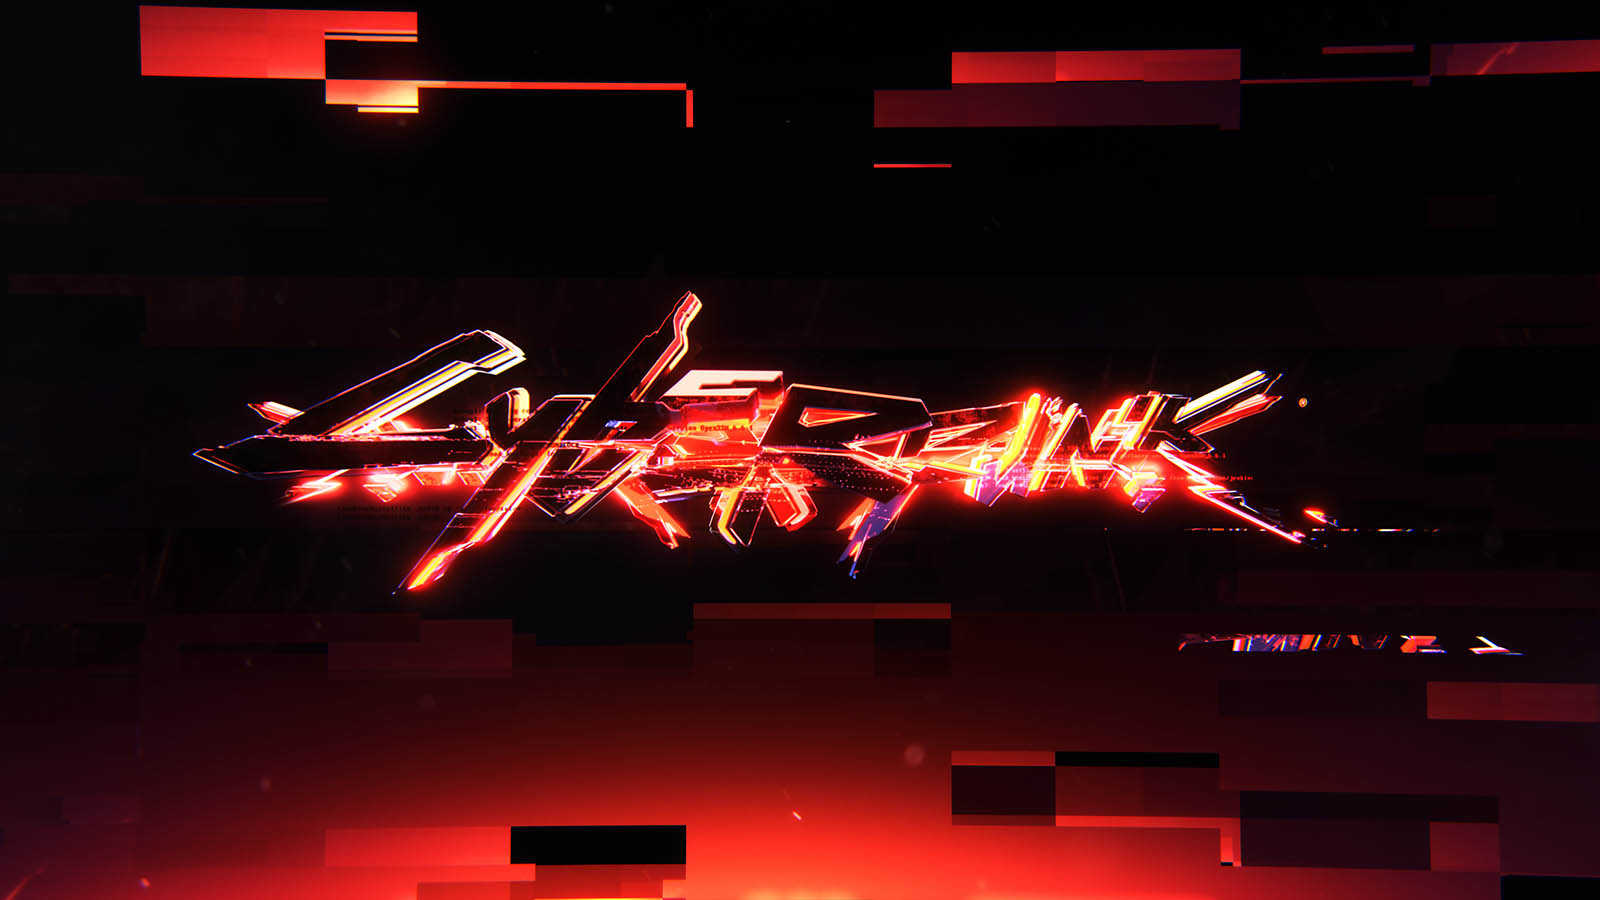 Cyberpunk_LogoSting_TerritoryStudio_007